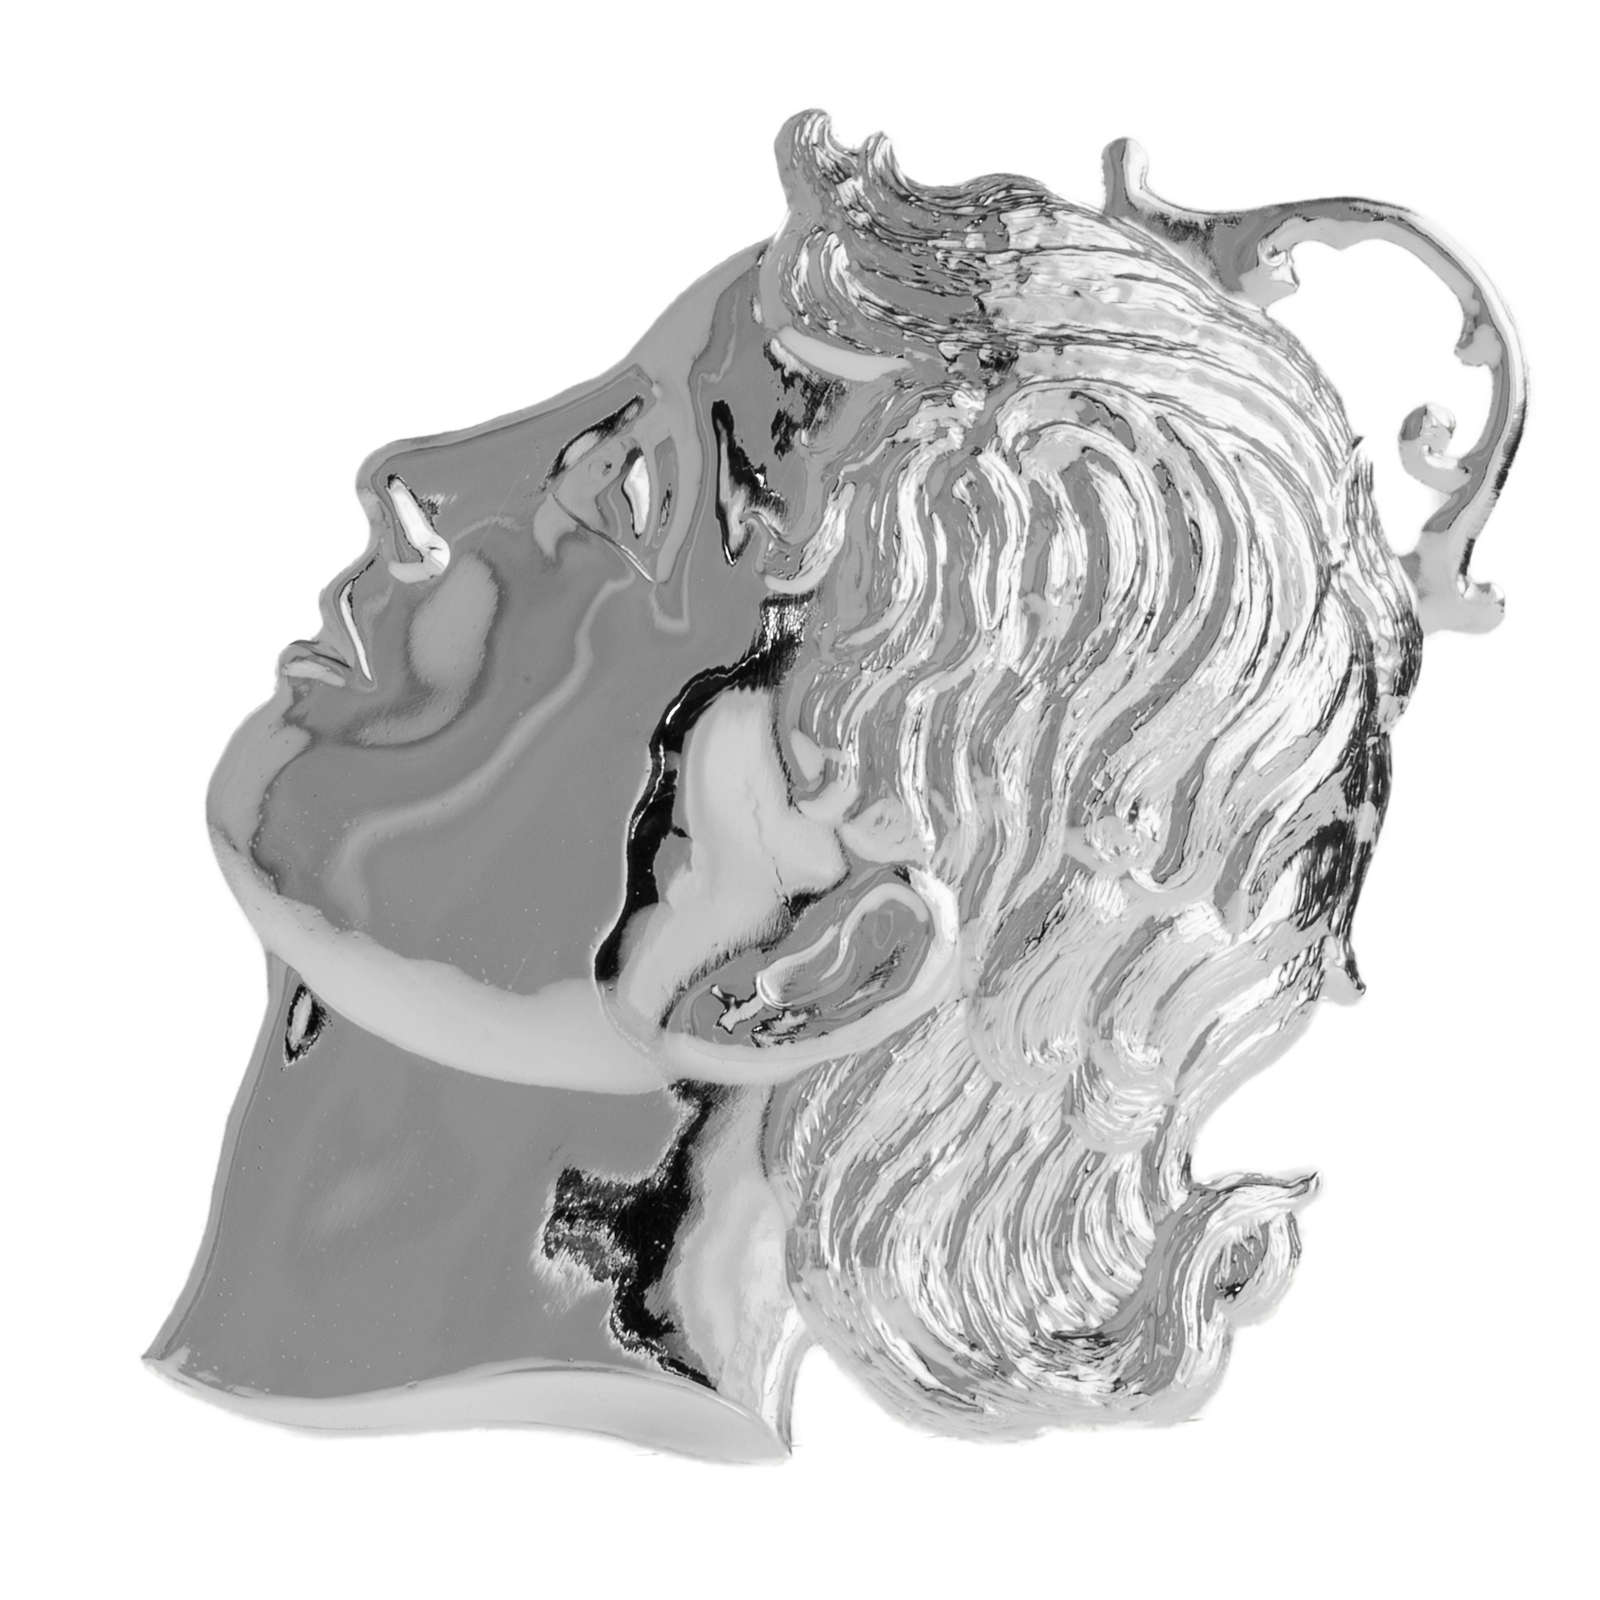 Ex-voto, child's head in sterling silver or metal 12cm 3